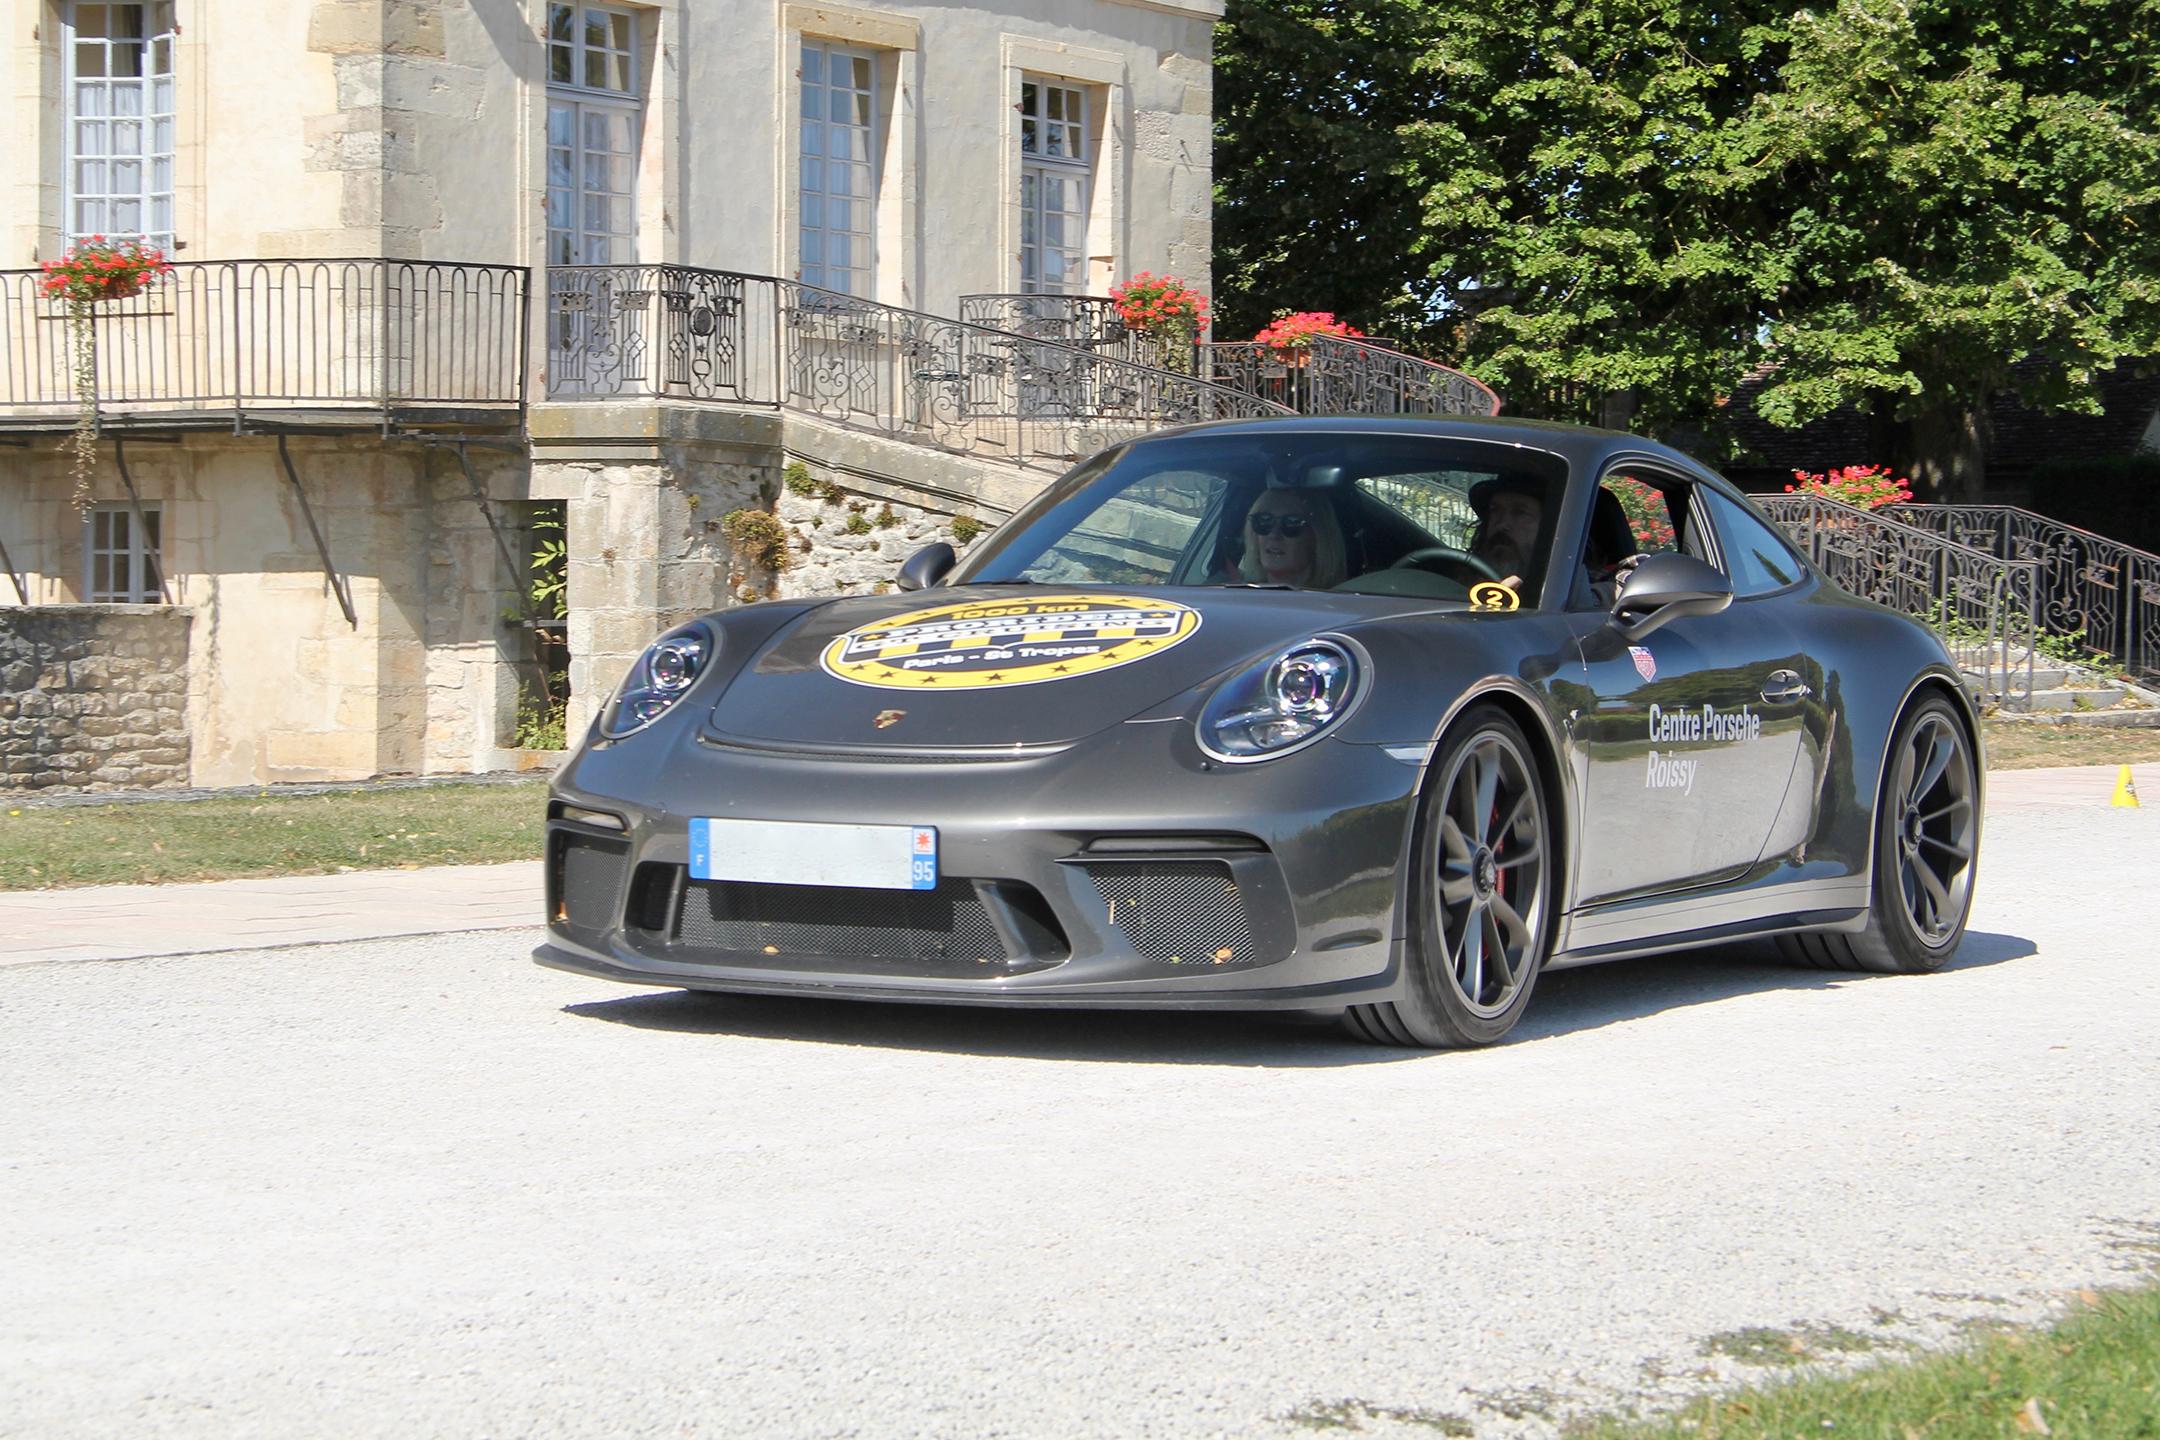 Porsche 991 GT3 Touring - Magnus Walker - pause photography - Prorider GT Cruising - 2019 - photo Ludo Ferrari